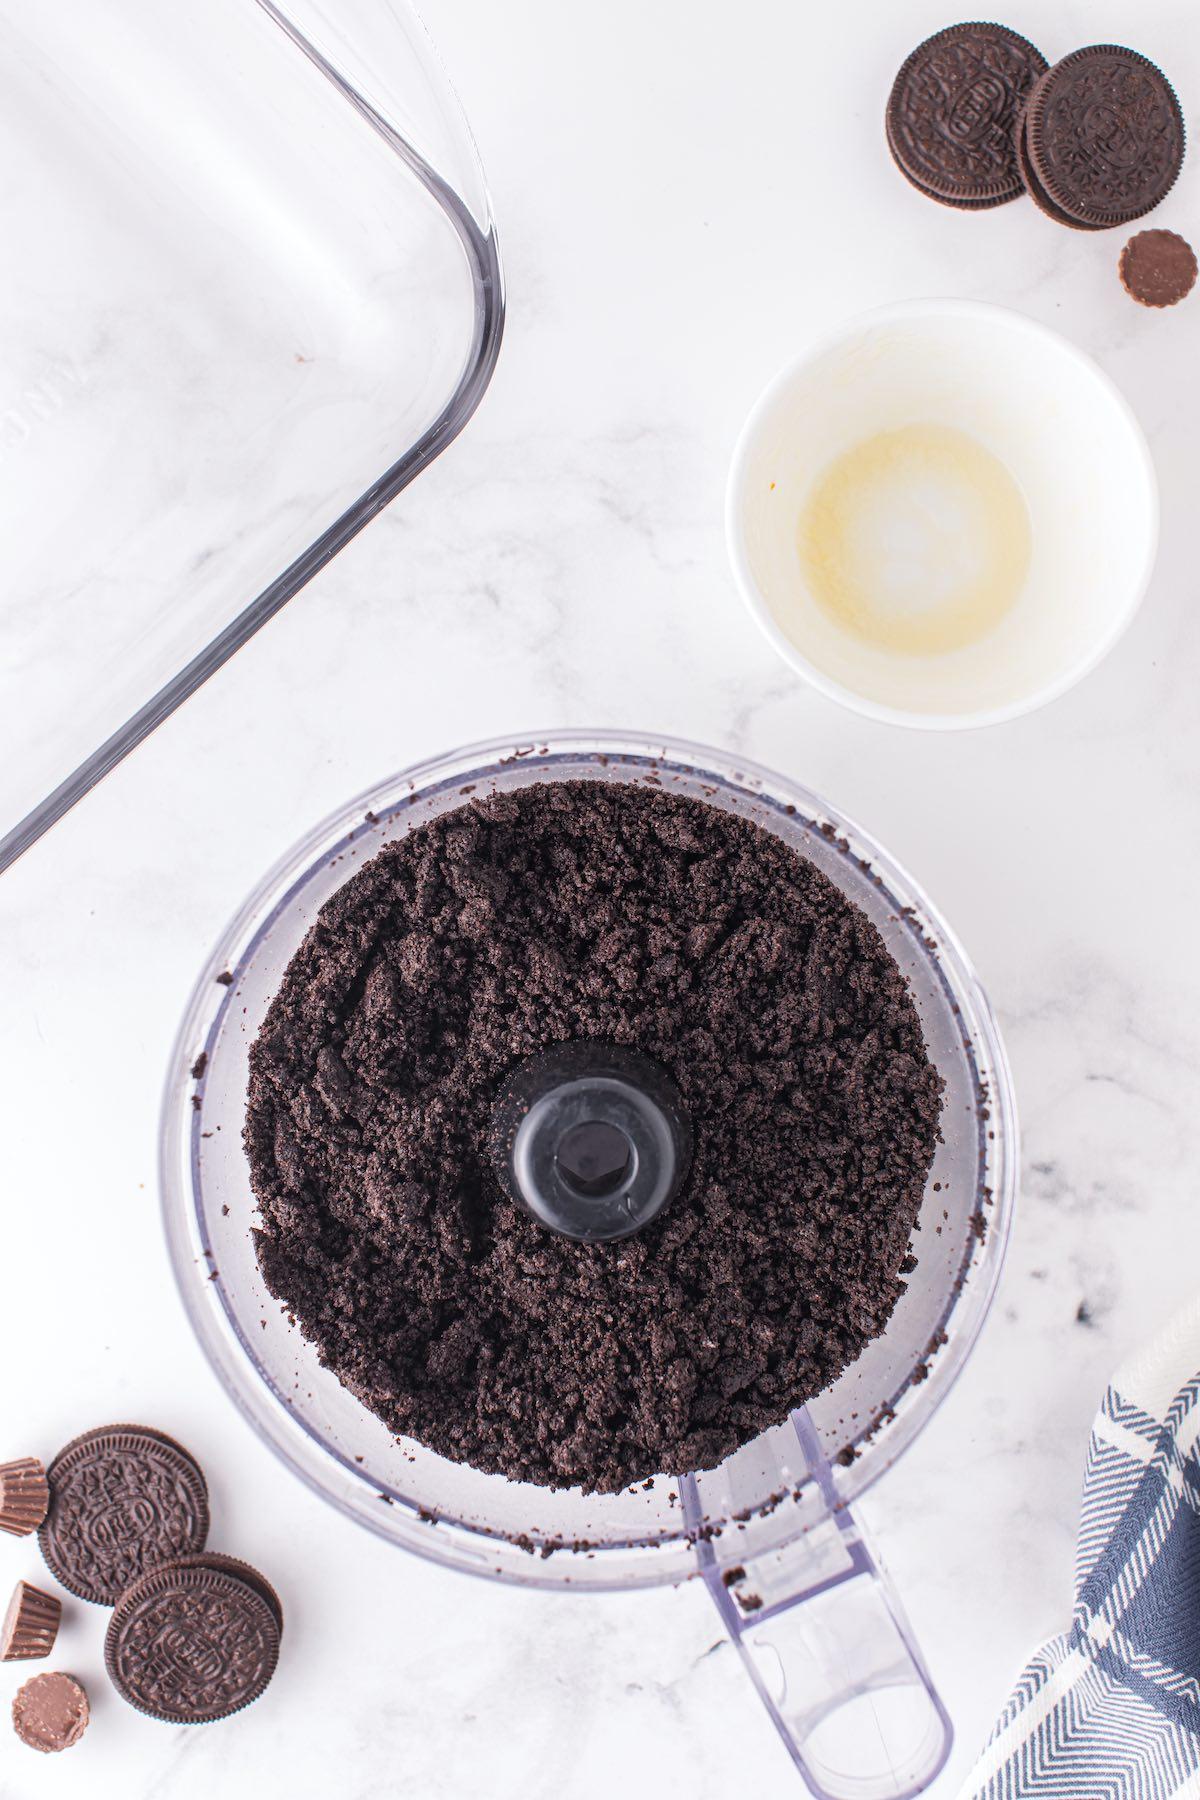 crushed oreo inside food processor